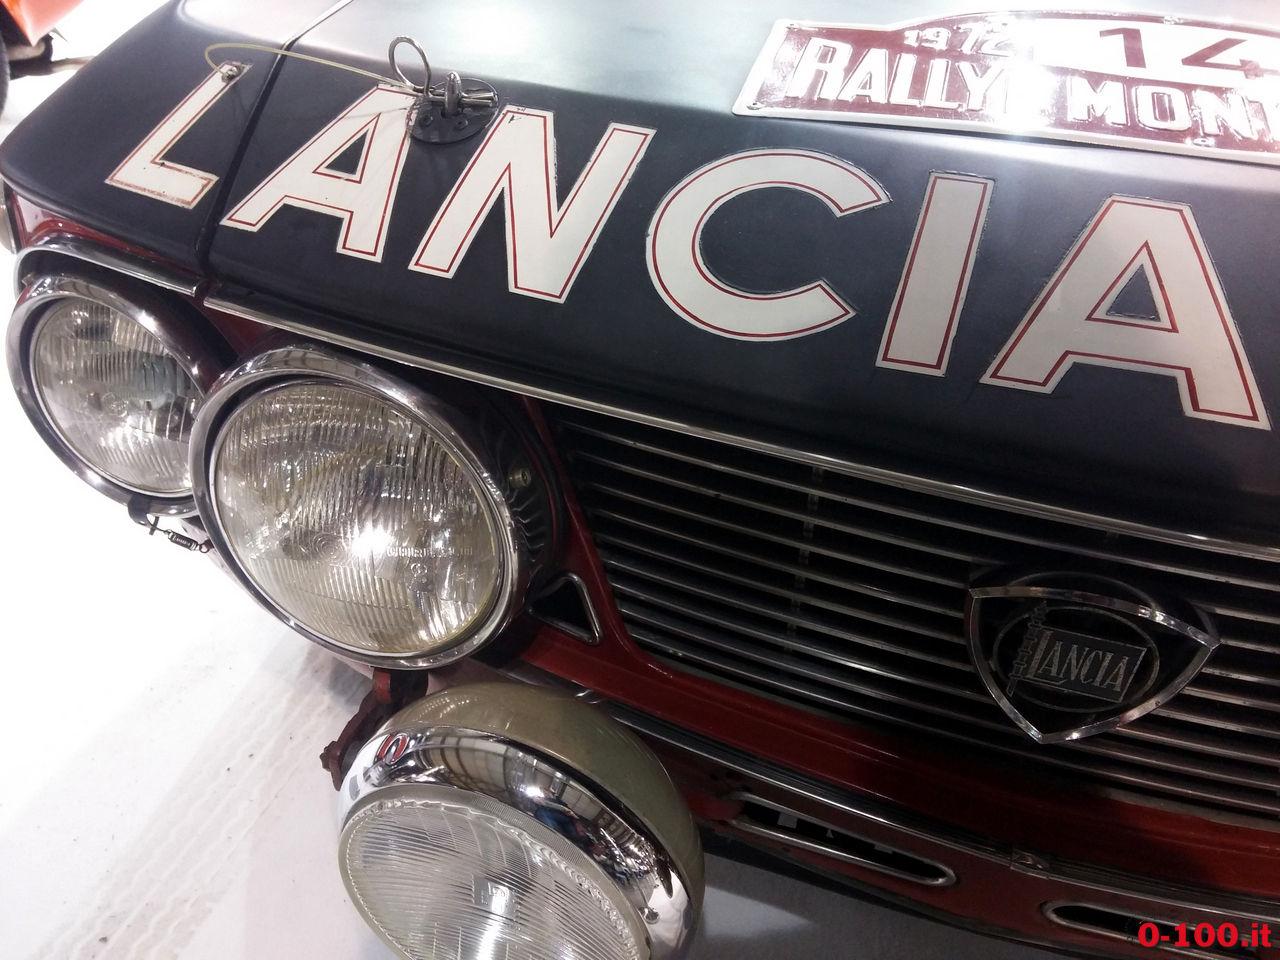 duemila-ruote-milano-autoclassica-rm-sothebys-0-100-lancia-fulvia-hf_32